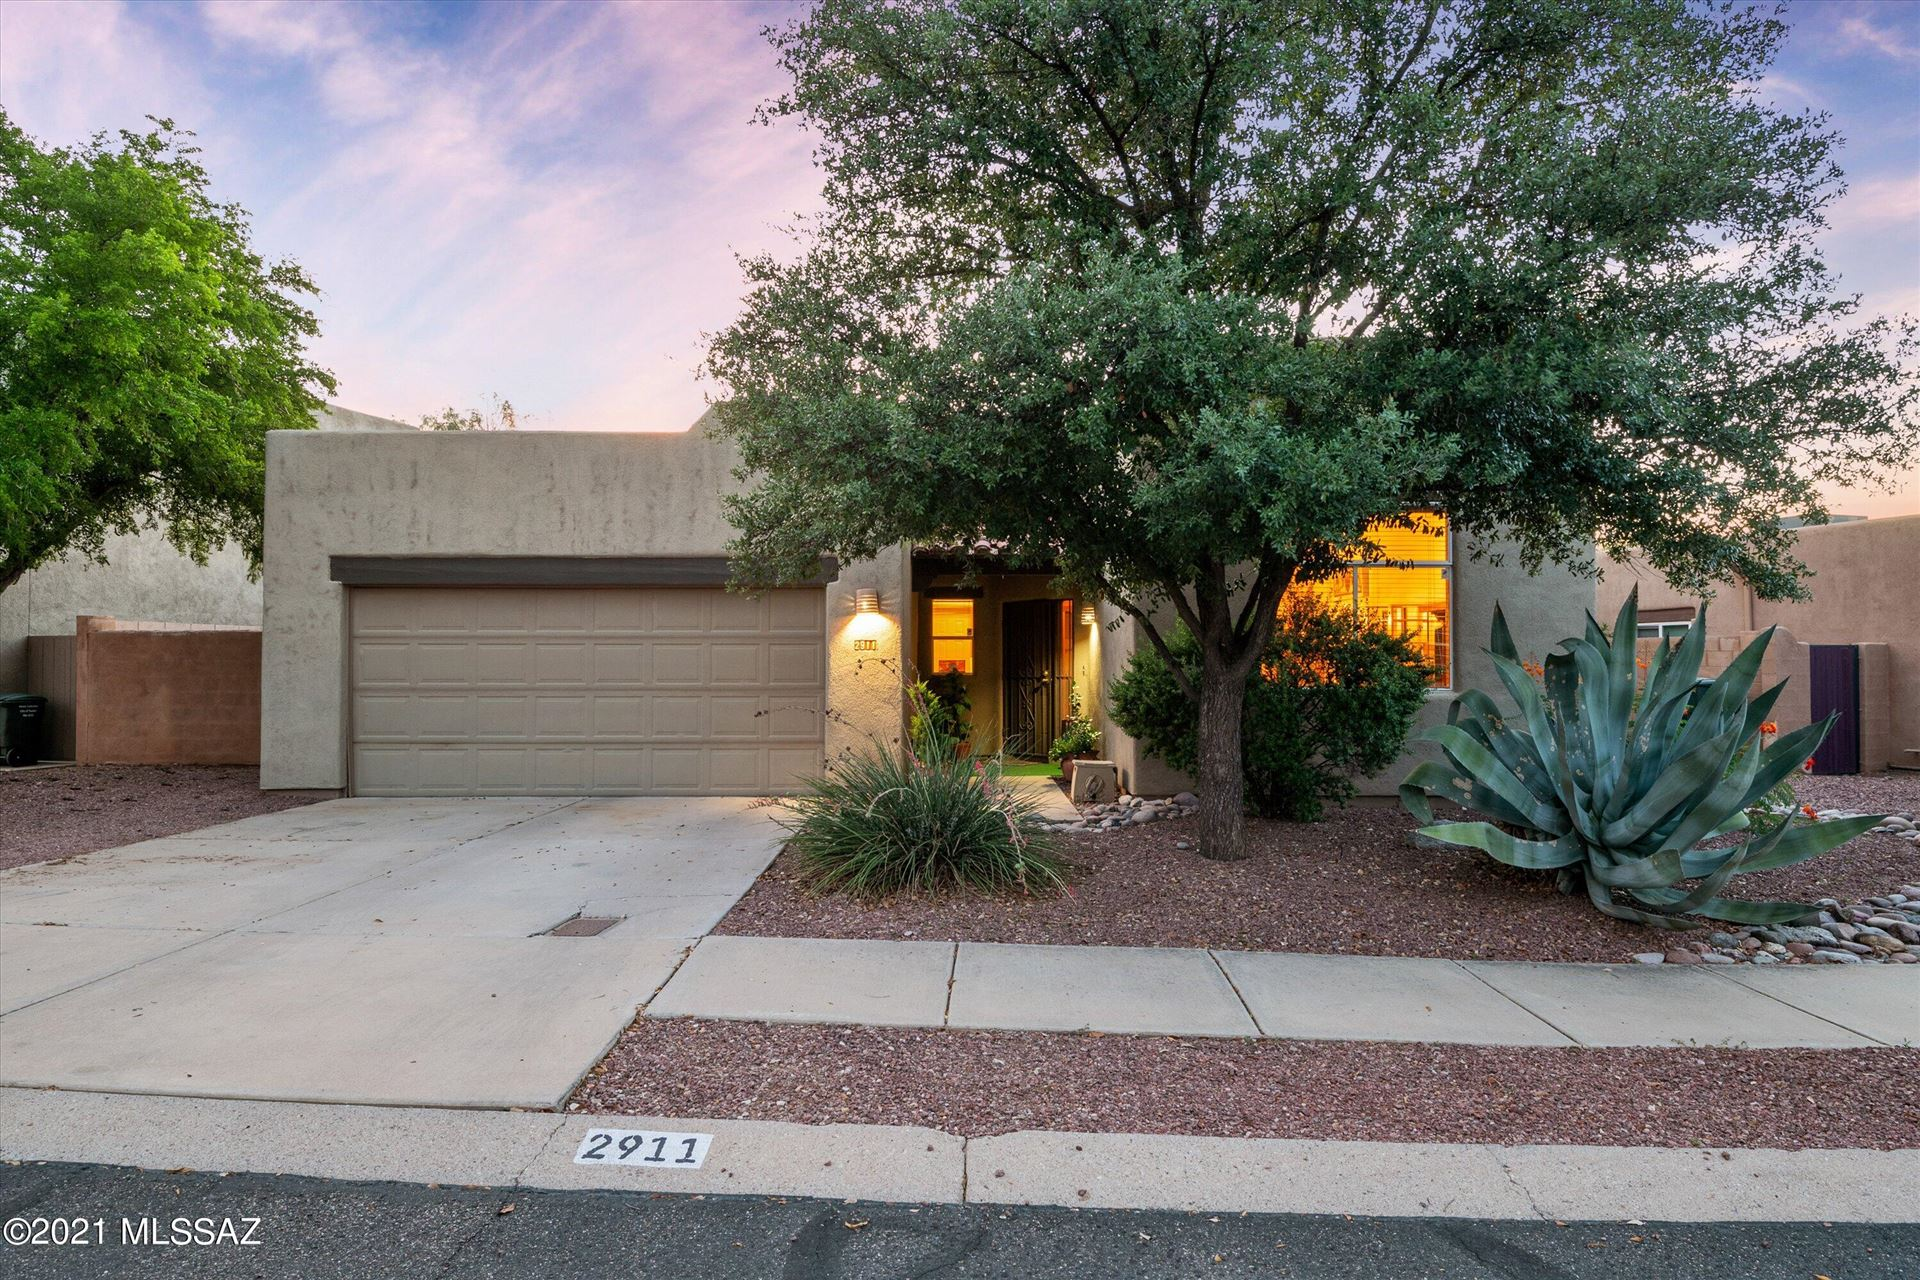 2911 E Avenida Portico, Tucson, AZ 85716 - MLS#: 22121042